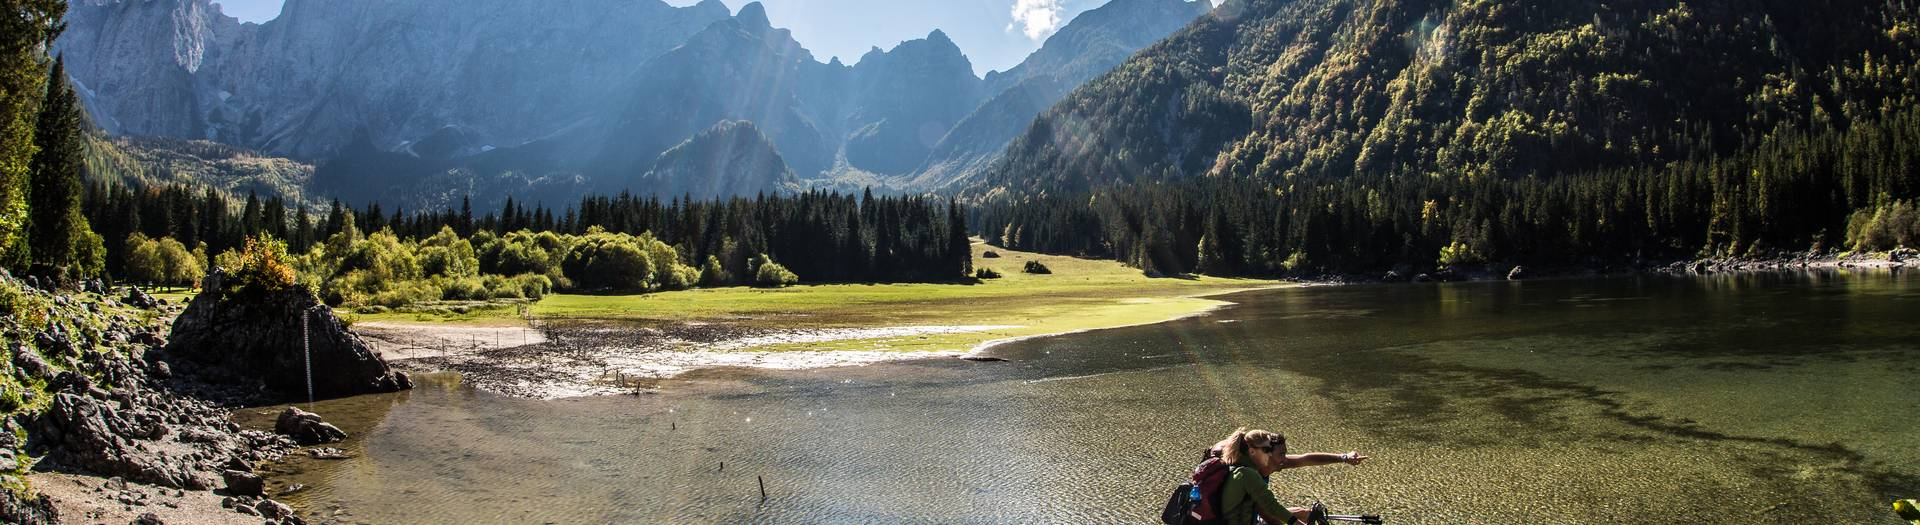 Alpe-Adria-Trail RT5 Weissenfelser Seen